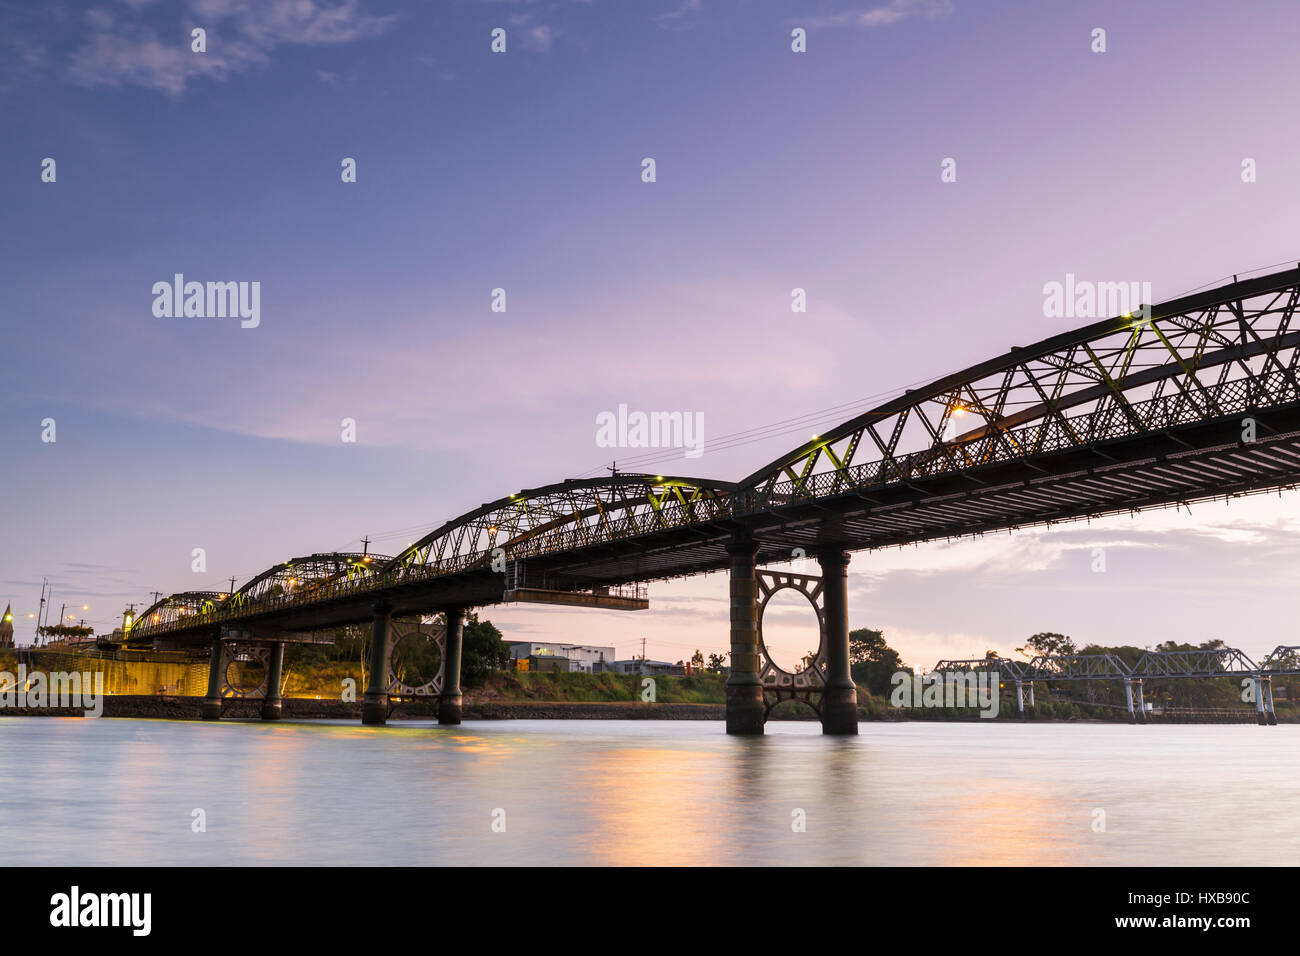 Il patrimonio-elencati Burnett Bridge al crepuscolo. Bundaberg, Queensland, Australia Immagini Stock